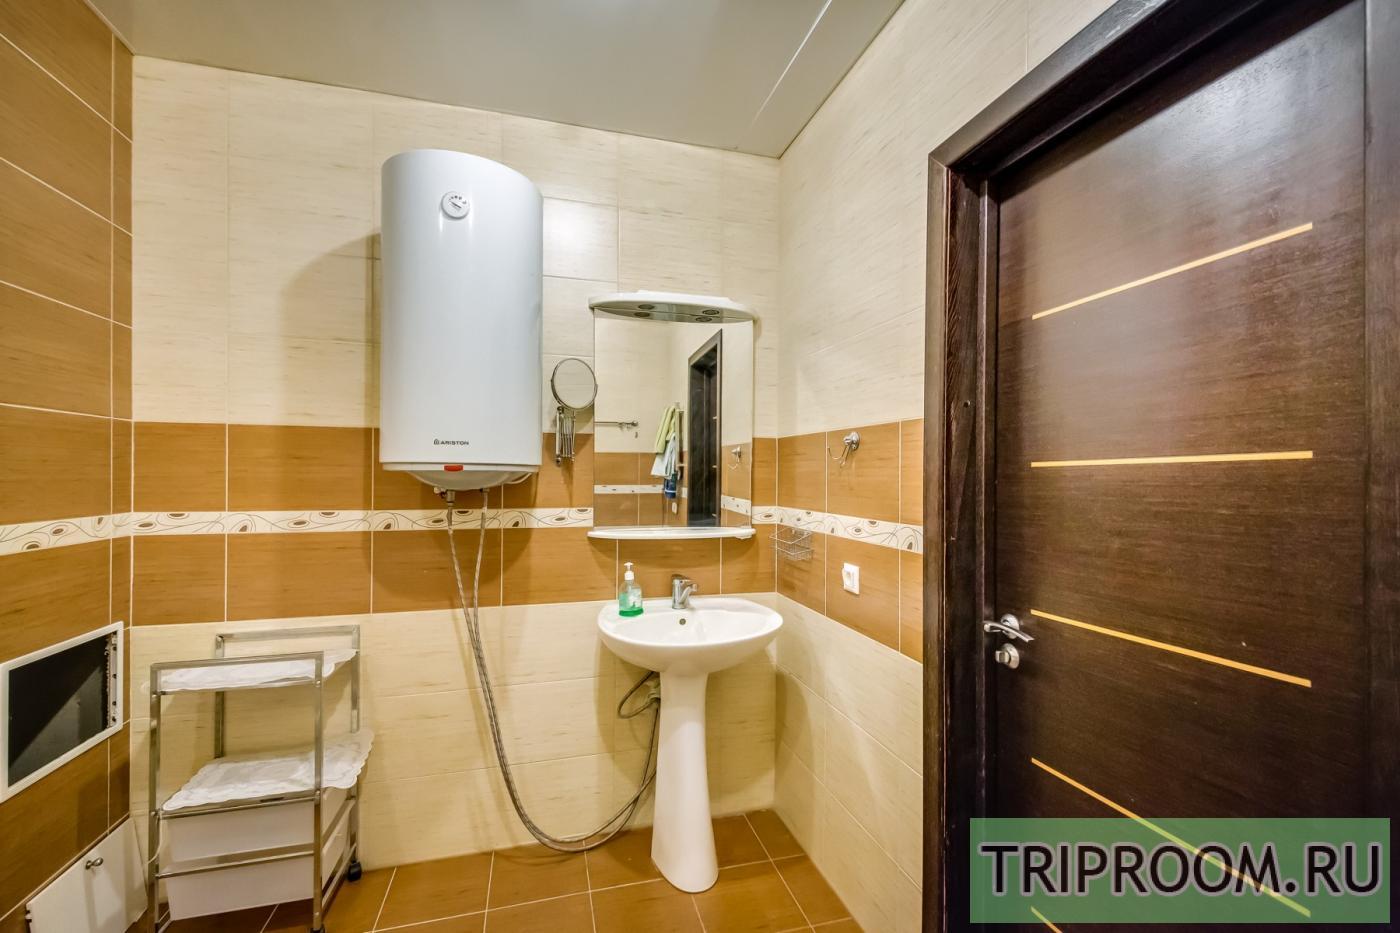 2-комнатная квартира посуточно (вариант № 23730), ул. Максима Горького улица, фото № 22